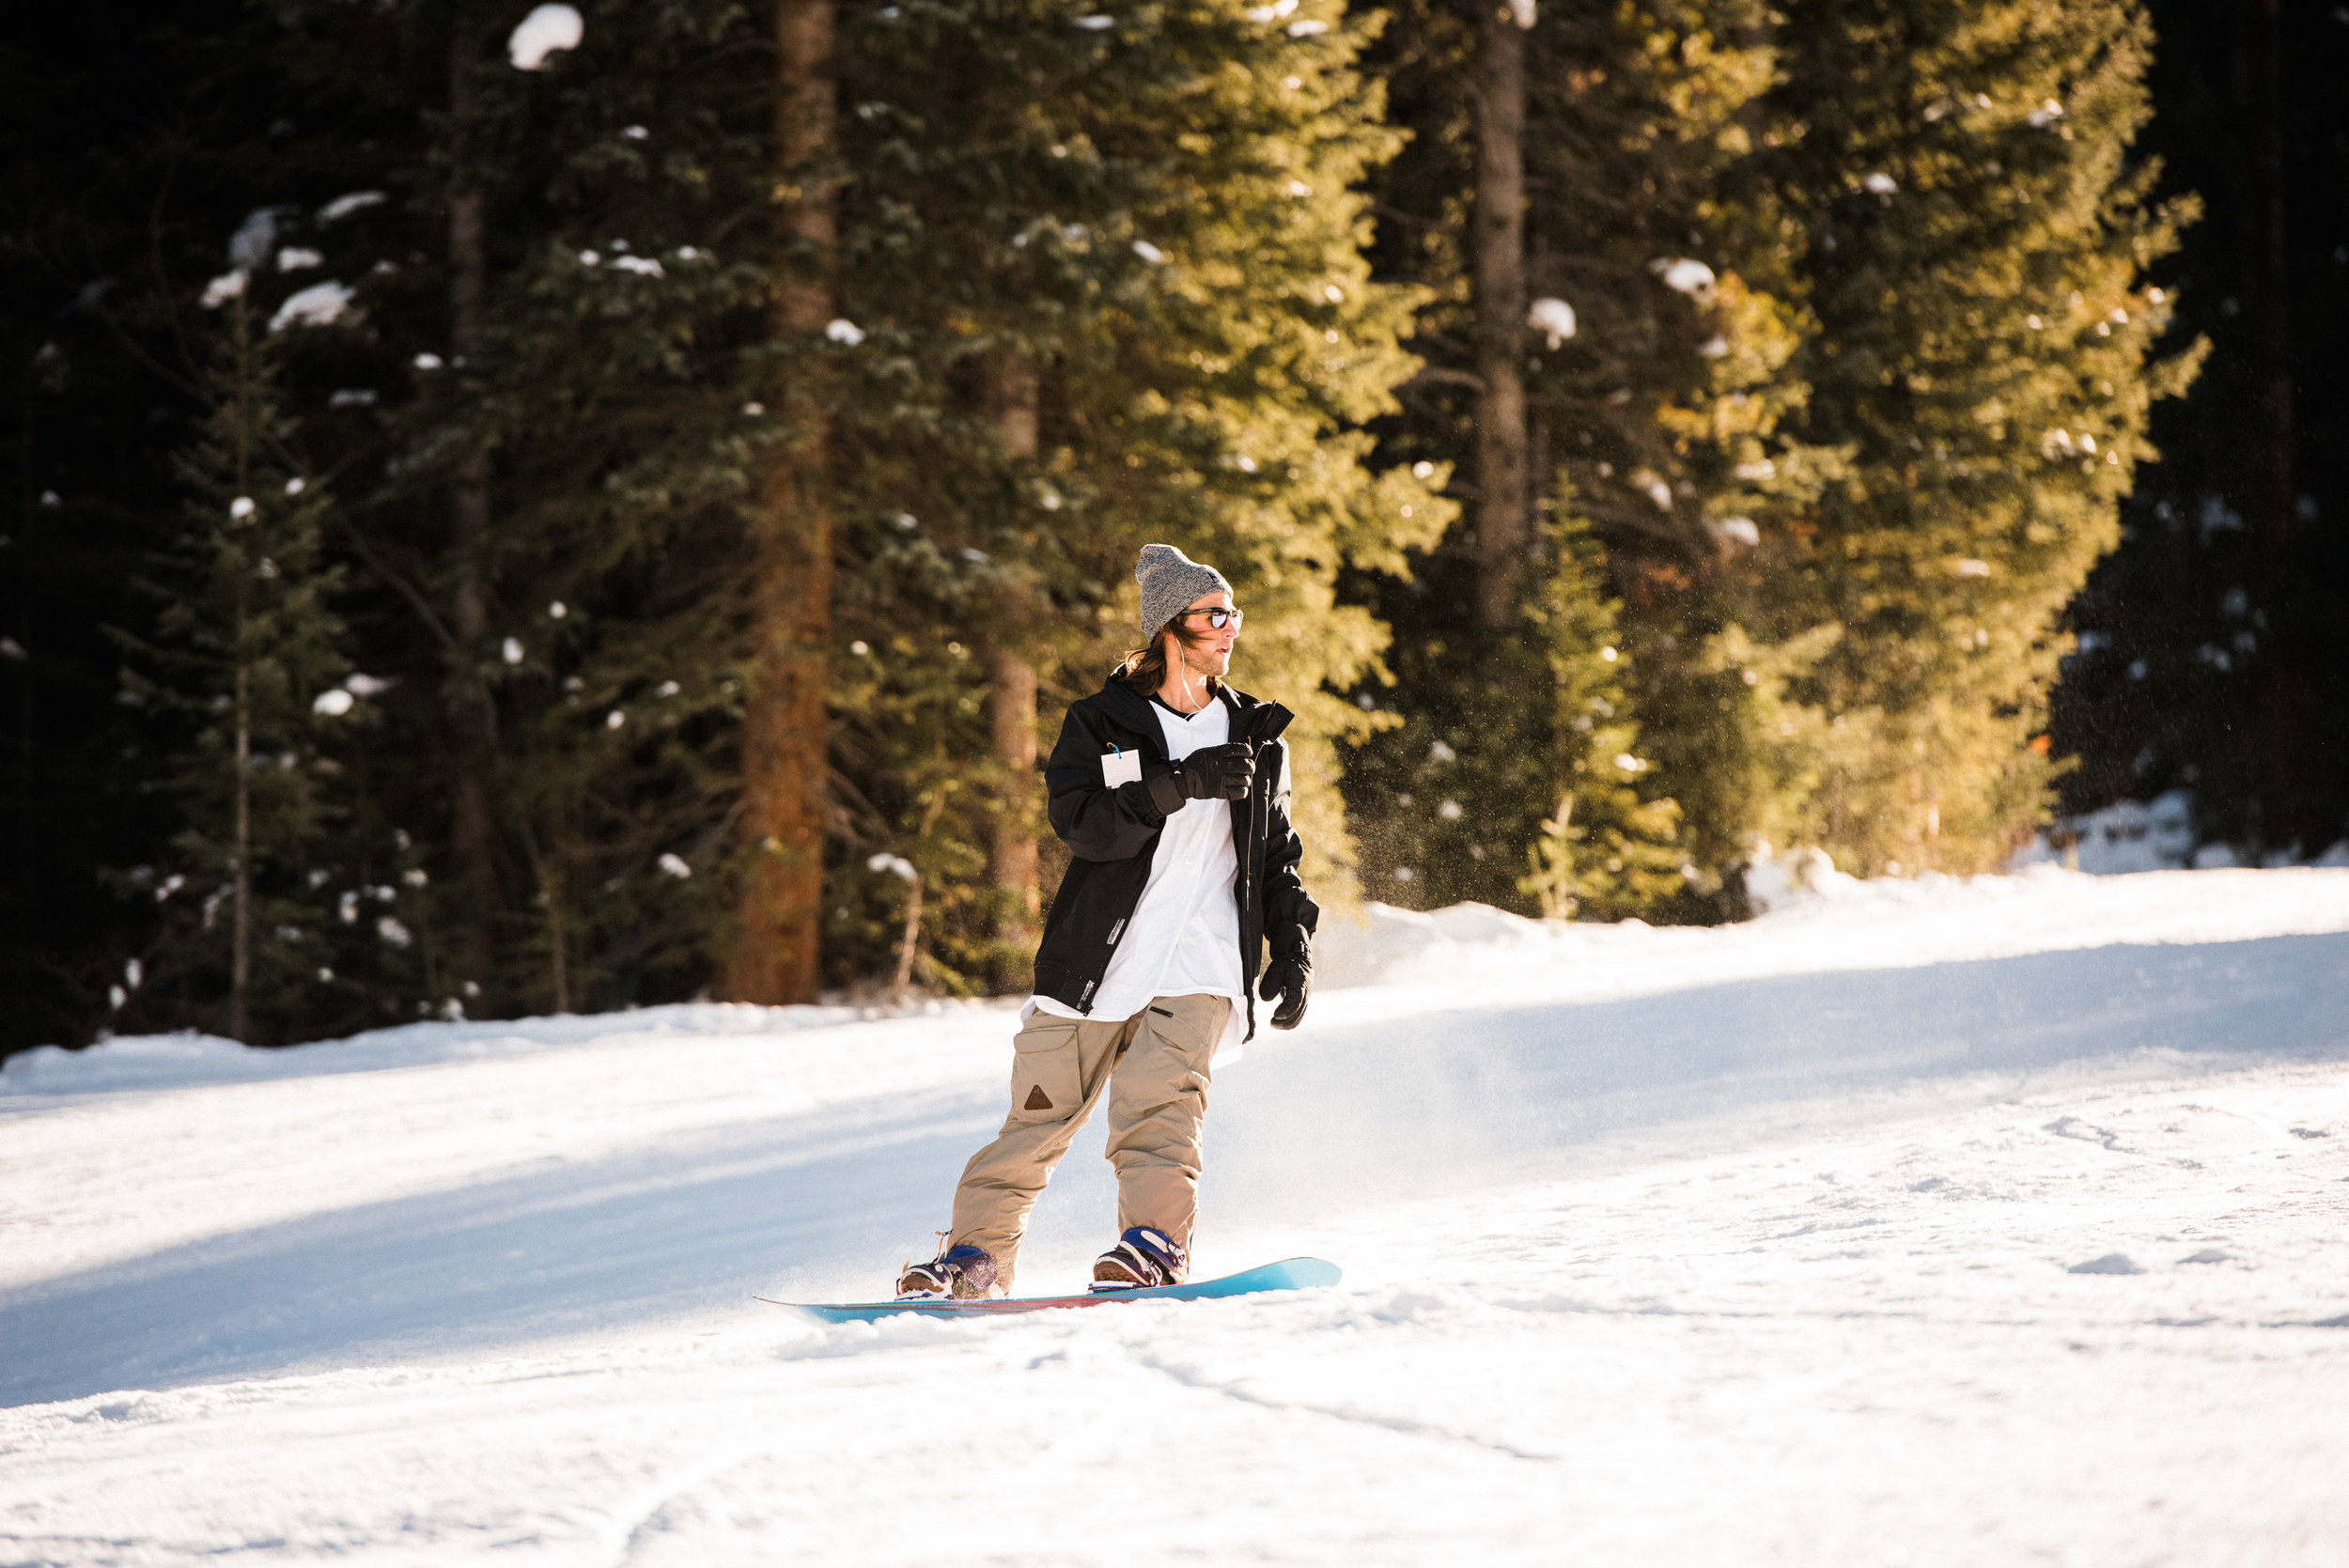 TaraShupe_Outdoor_Photographer_Loweprobags_Colorado_Copper_Mountains_Ski_54.jpg